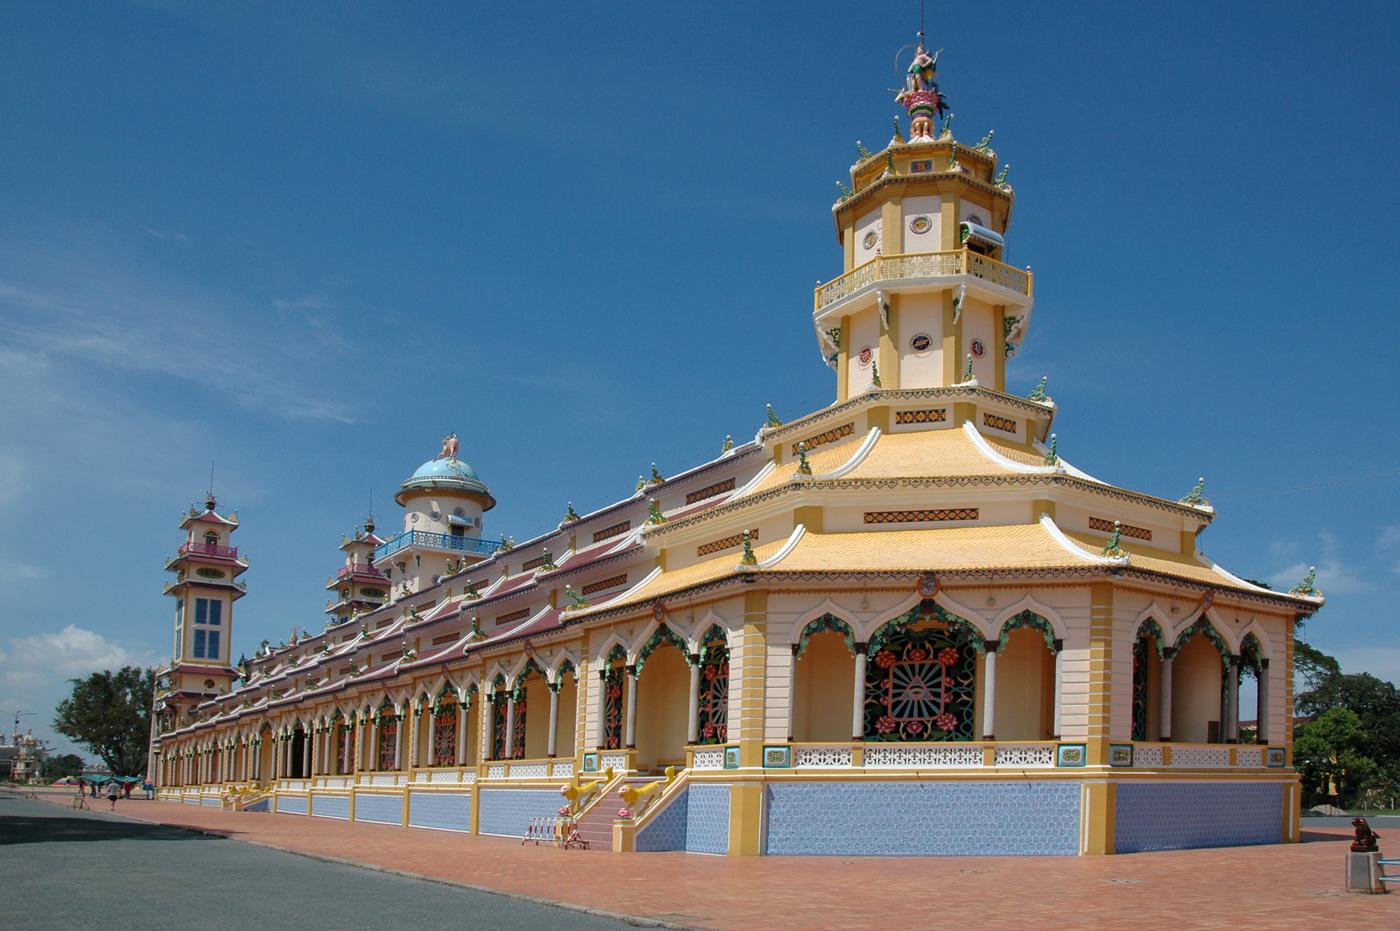 Vietnam, cao dai temple in tay ninh